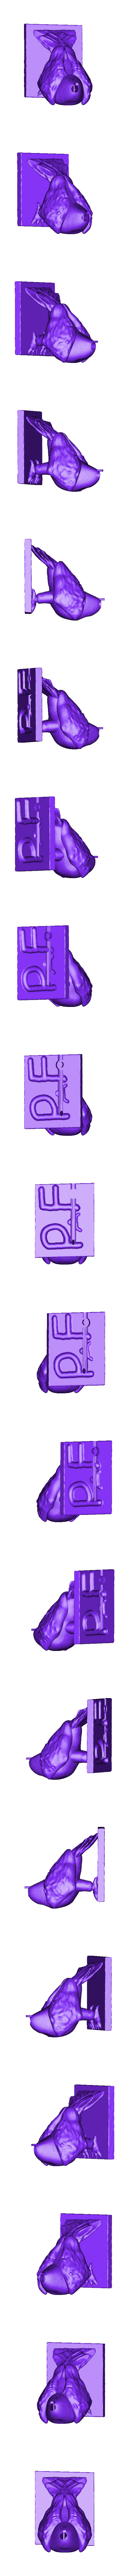 Bald_Eagle_body.stl Download free OBJ file Eagle Lamp/Nightlight • 3D printable template, Pza4Rza